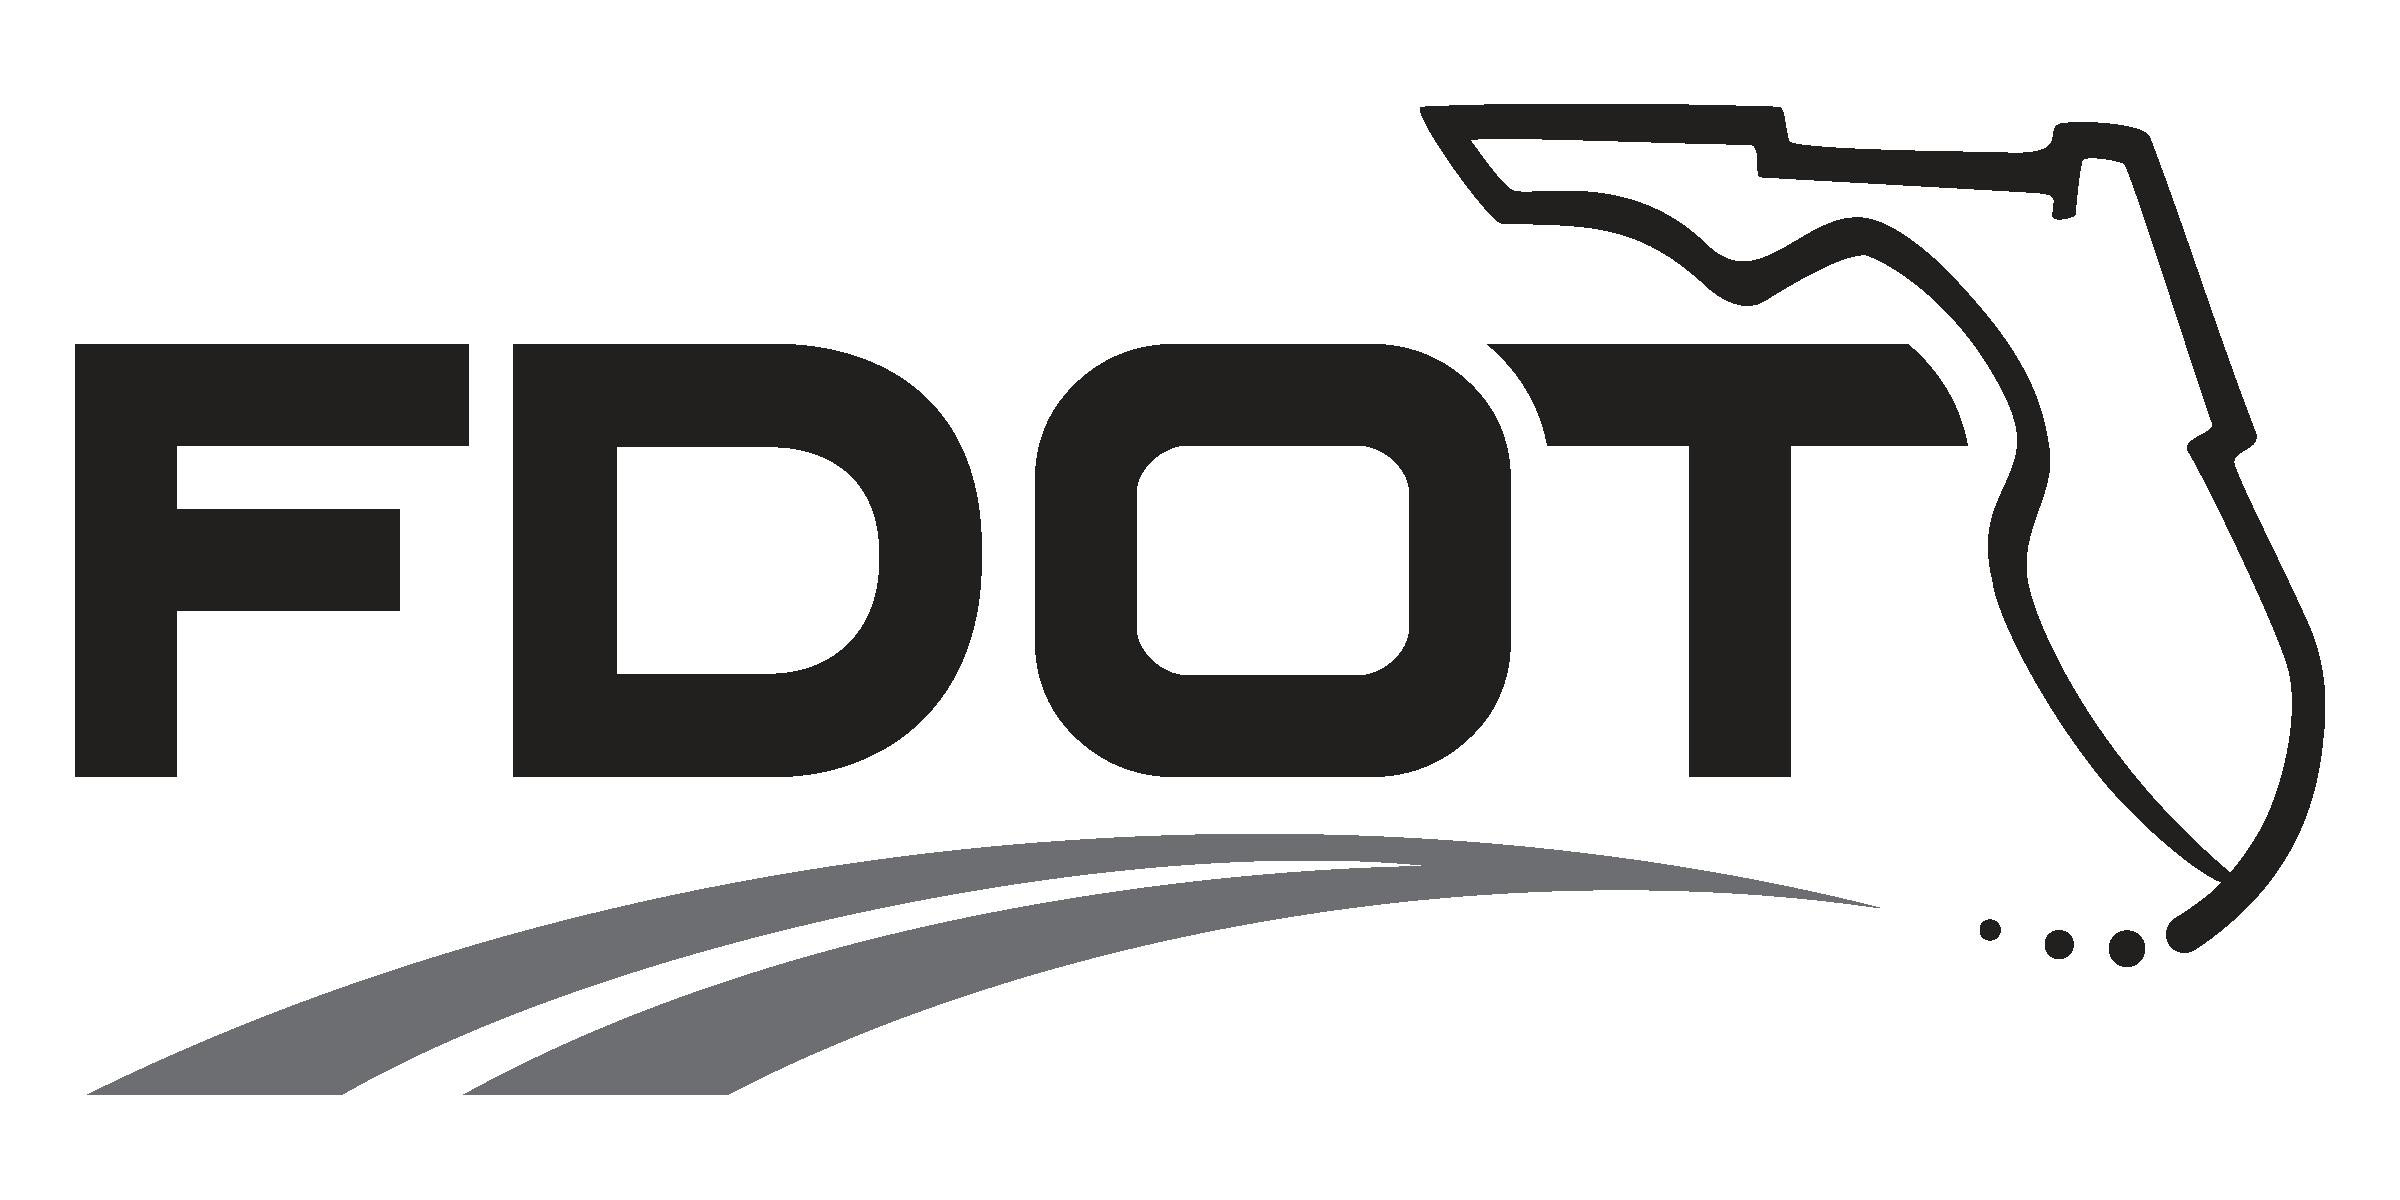 client-logos-FDOT_Logo_grayscale